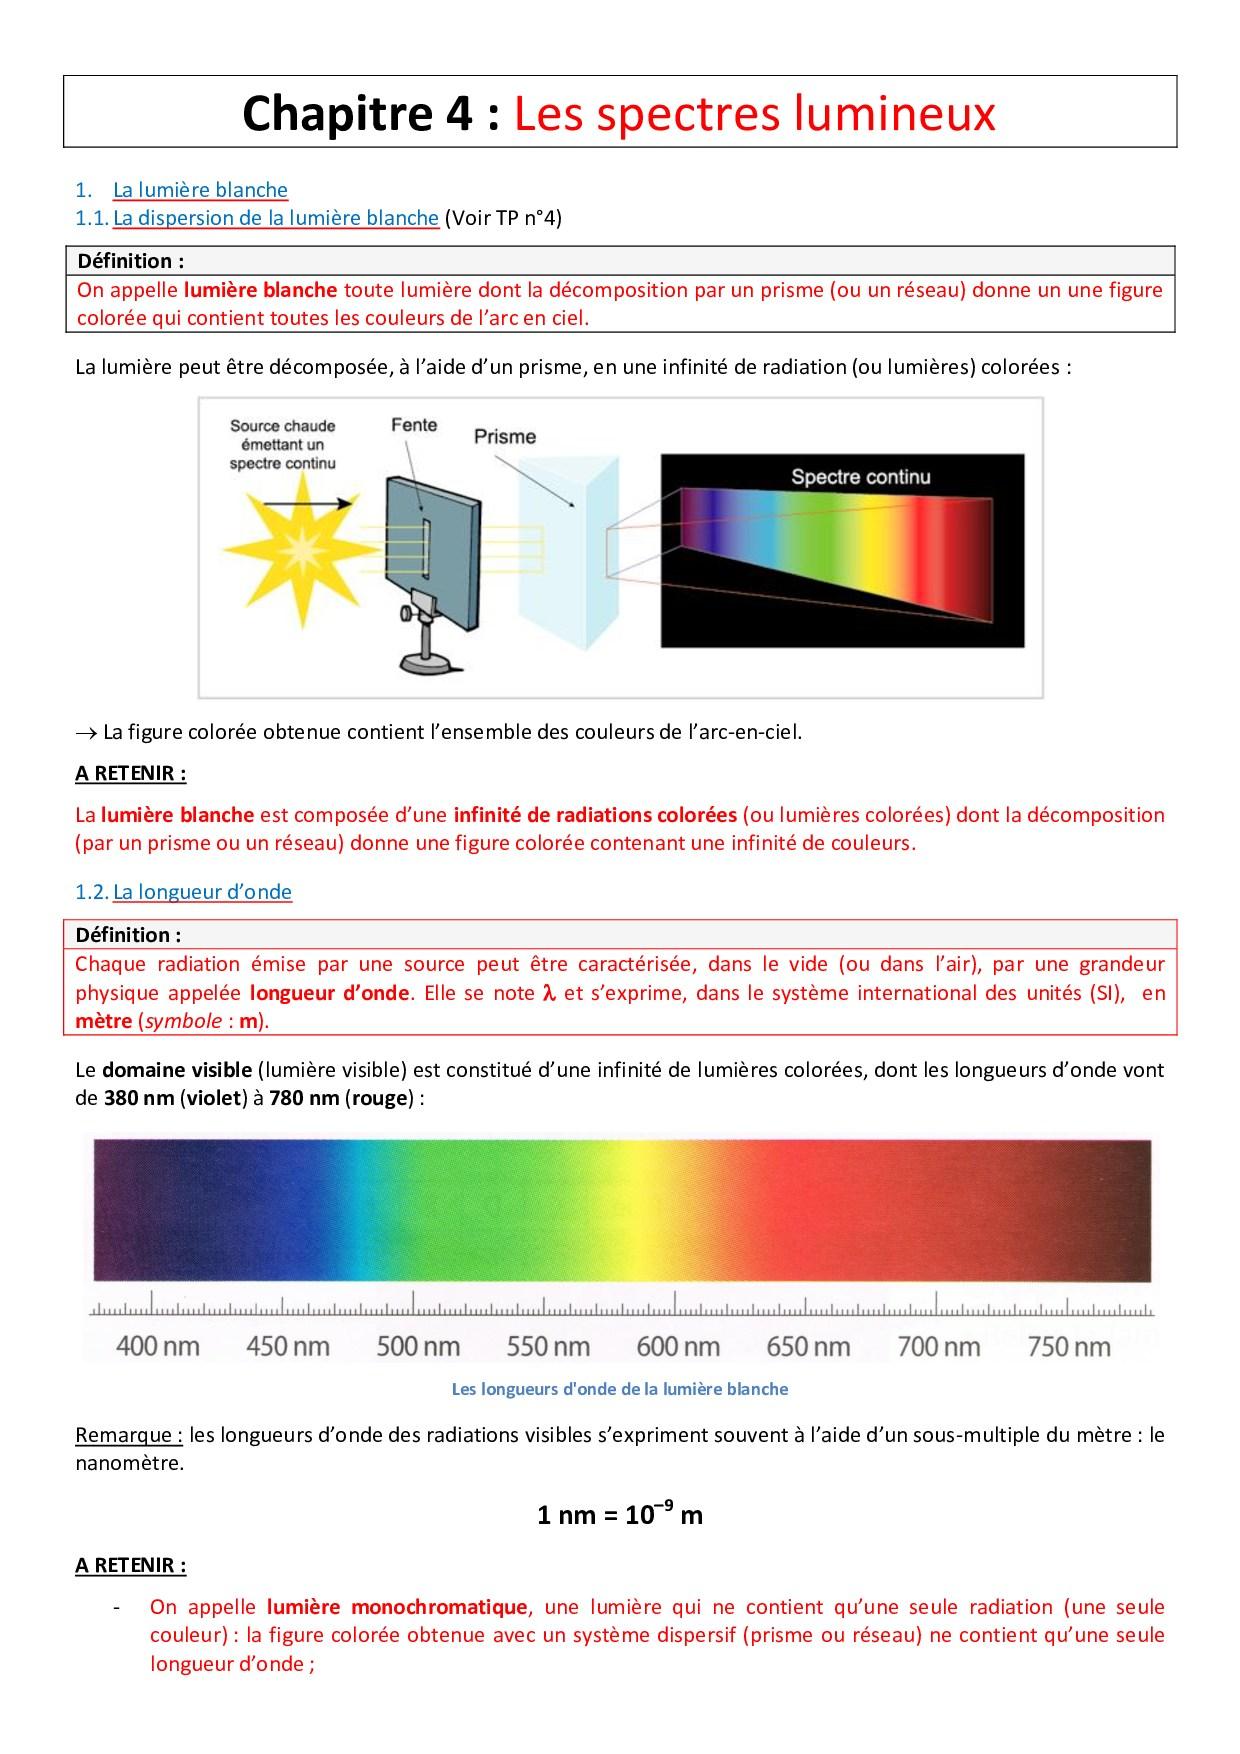 Les spectres lumineux - Cours - AlloSchool